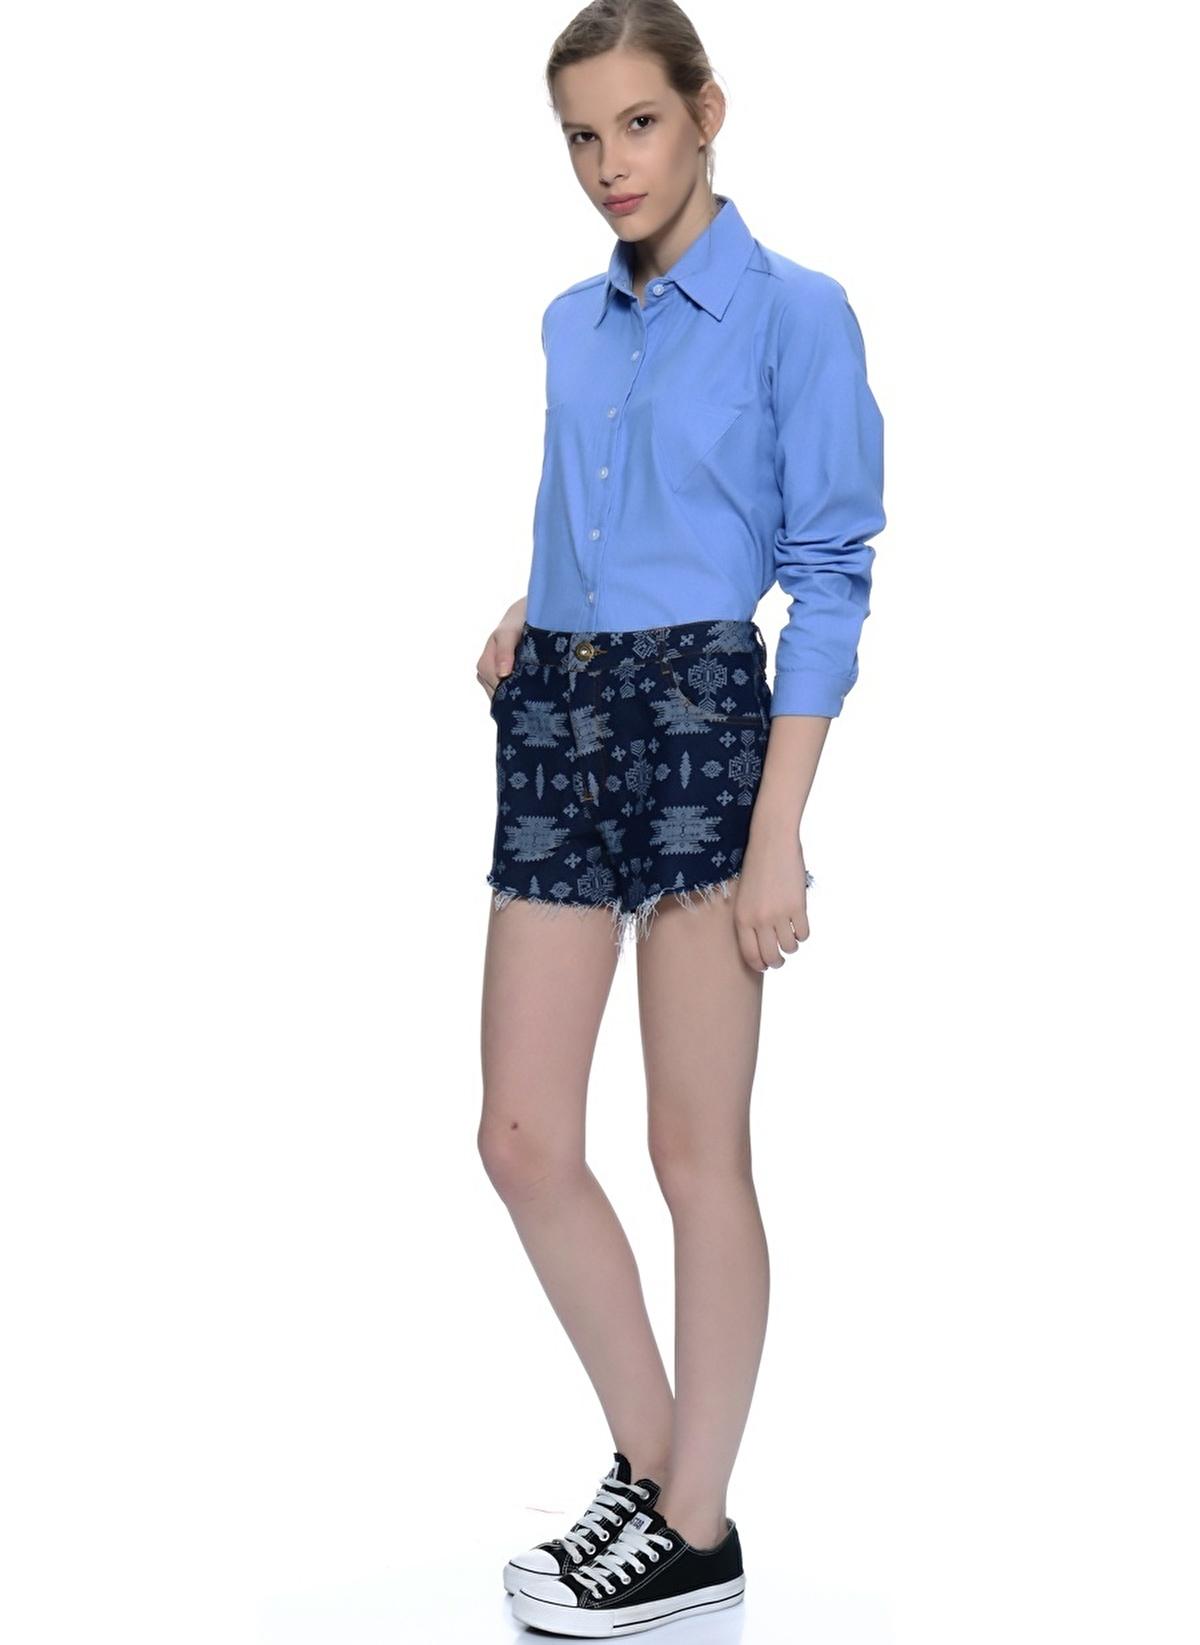 Freemınds Şort Es15709 – Oca Shorts – 61.99 TL